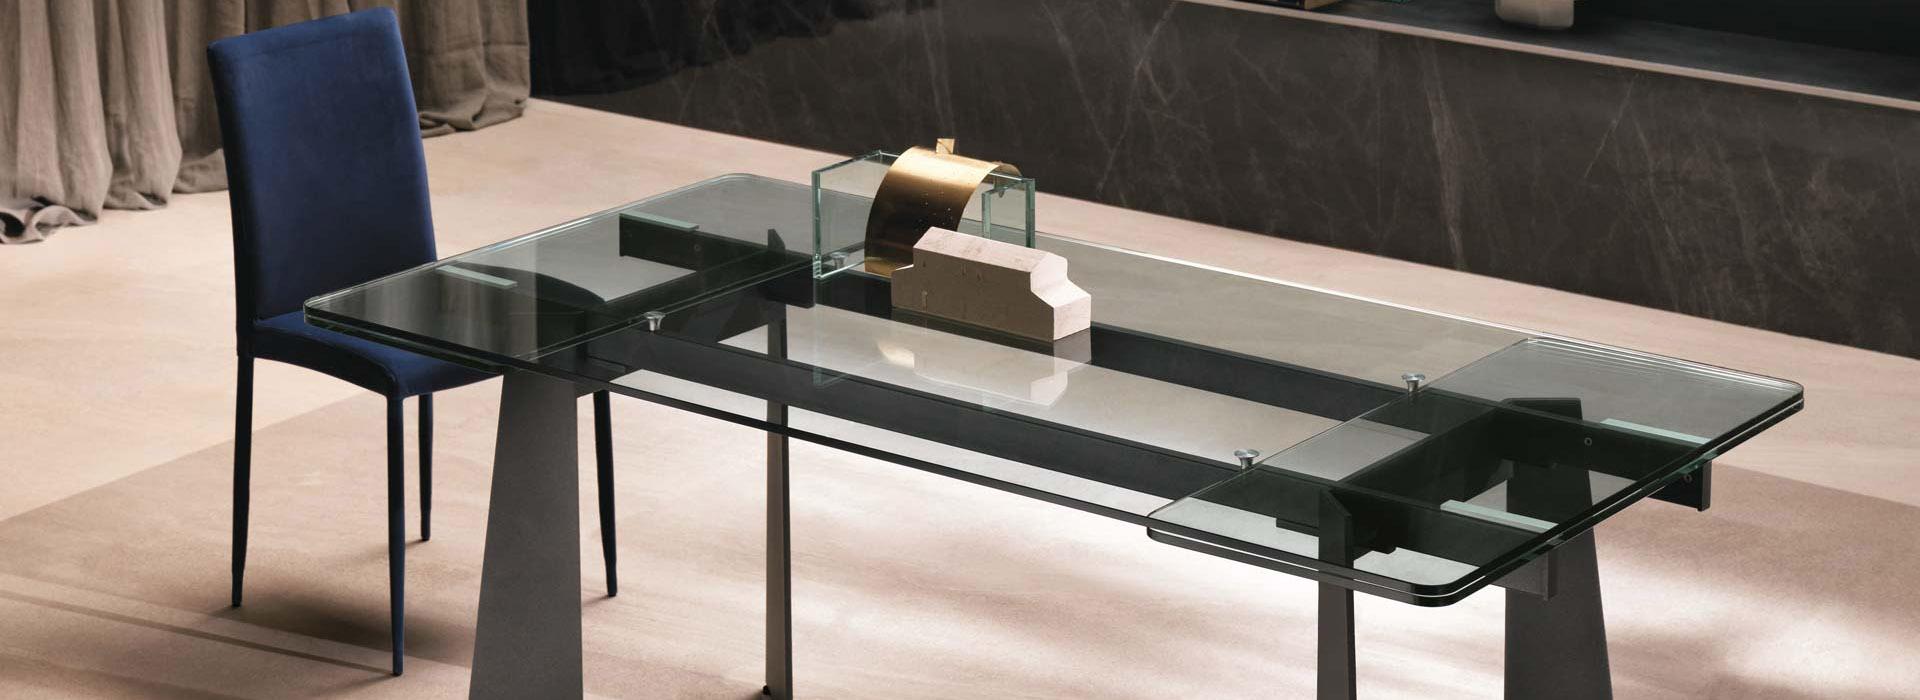 Toledo tavoli riflessi ginocchi arredamenti for Ginocchi arredamenti